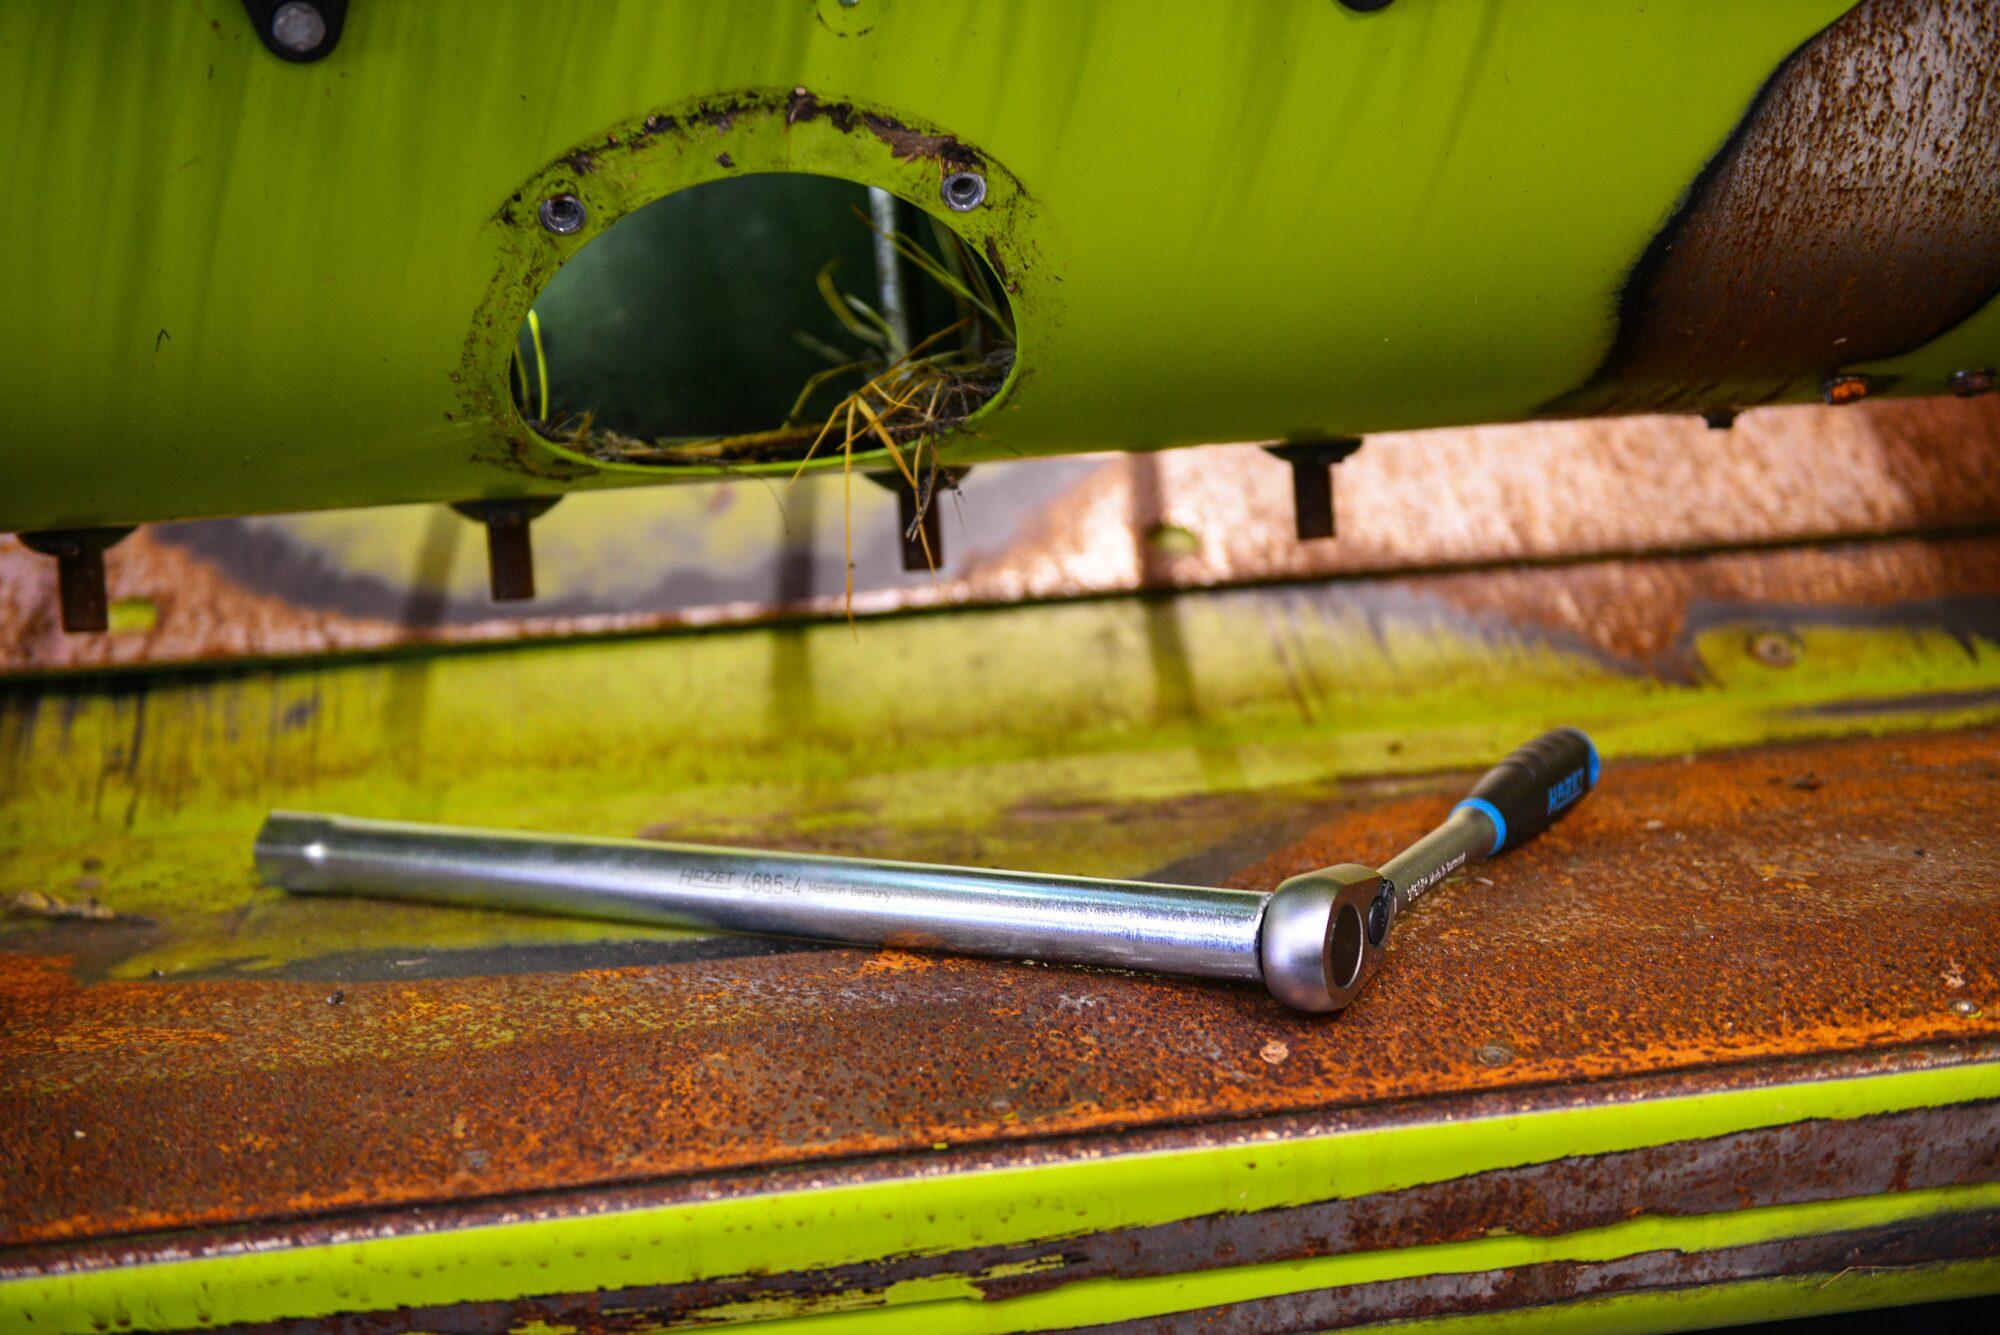 HAZET Rohr-Steckschlüssel 4685-4 ∙ Vierkant hohl 12,5 mm (1/2 Zoll) ∙ Außen-Sechskant Profil ∙ 24 mm